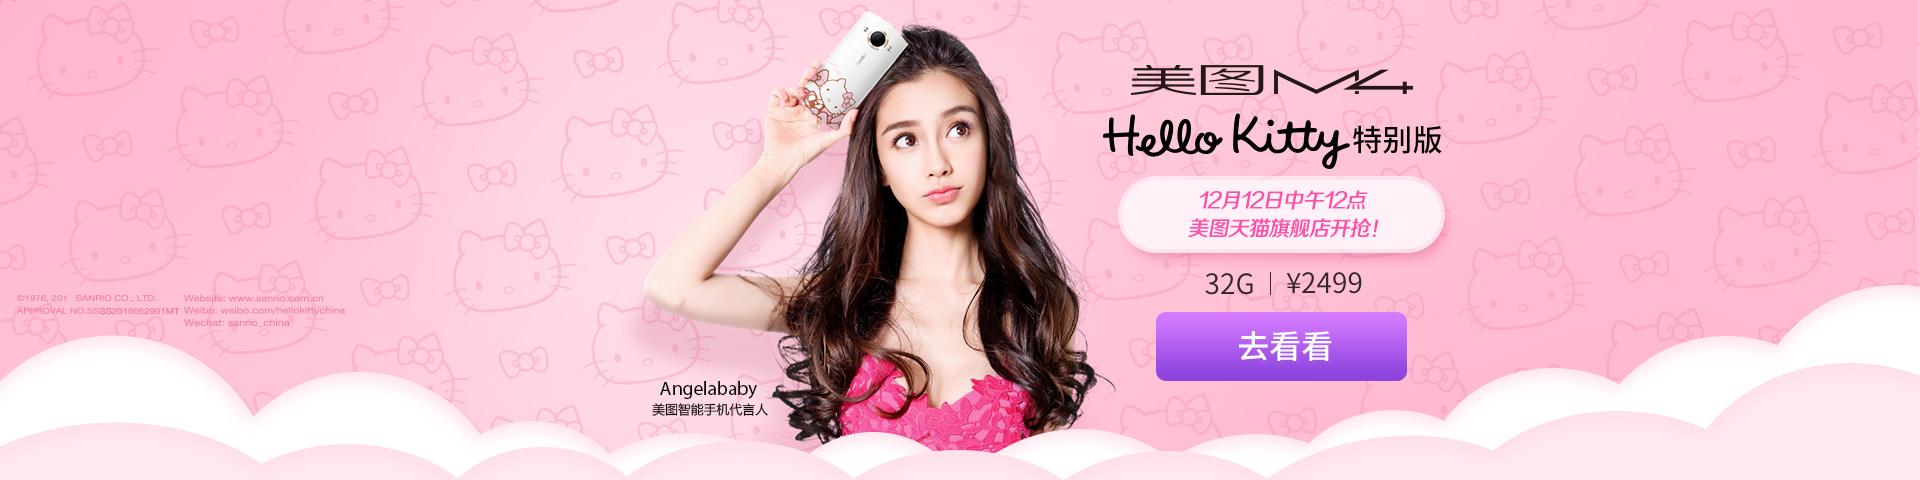 Hello Kitty双12抢购